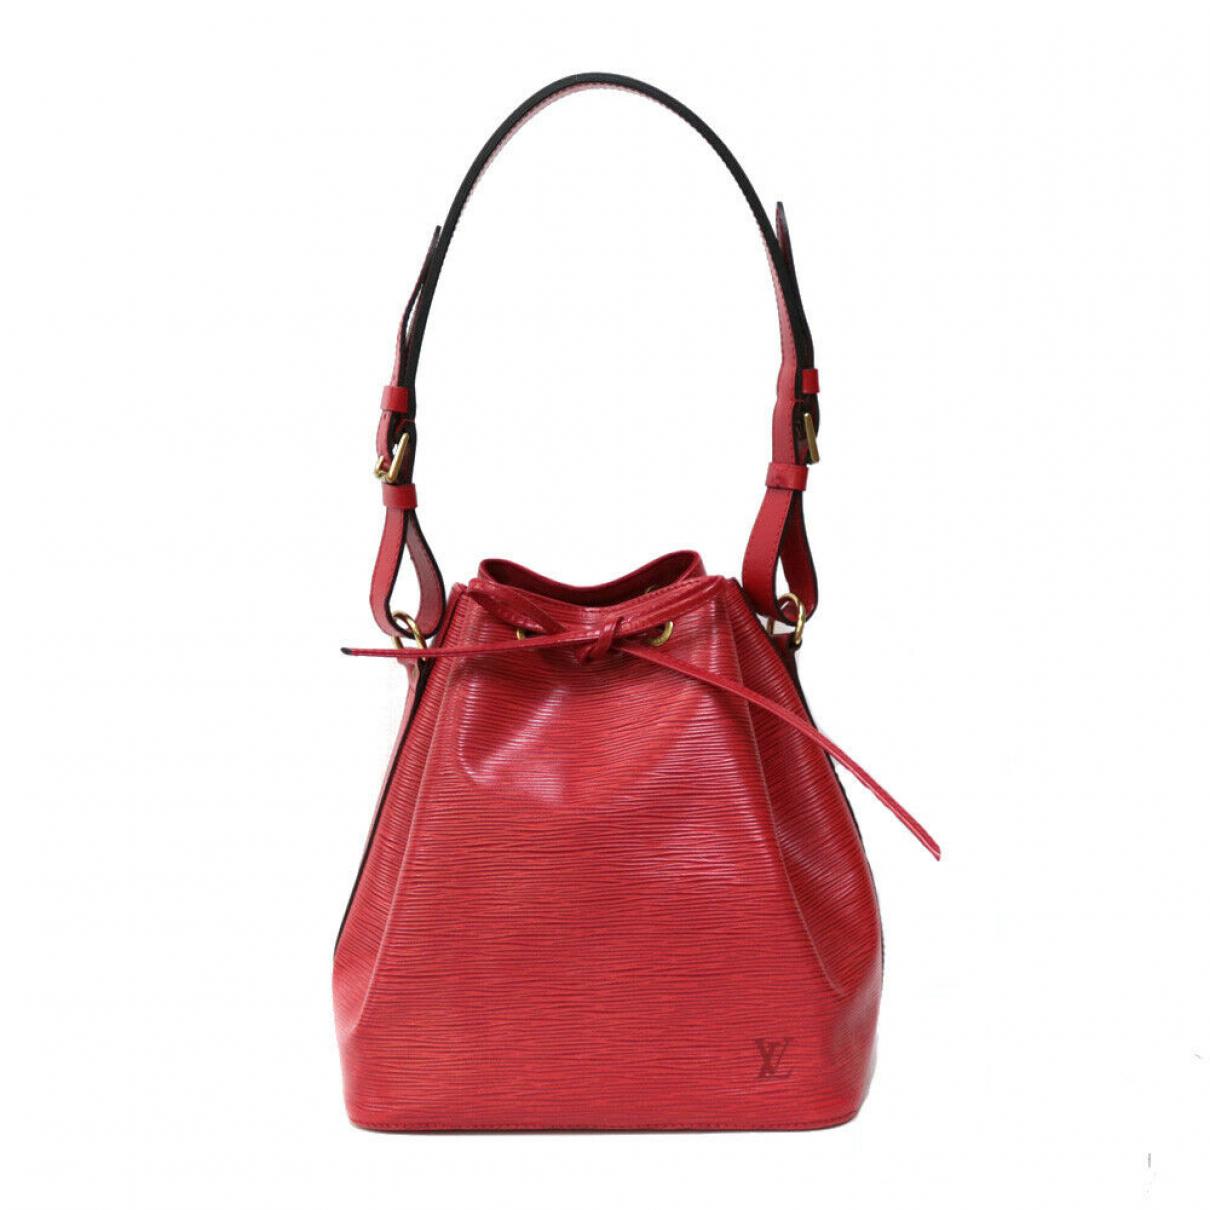 Louis Vuitton - Sac a main   pour femme en cuir